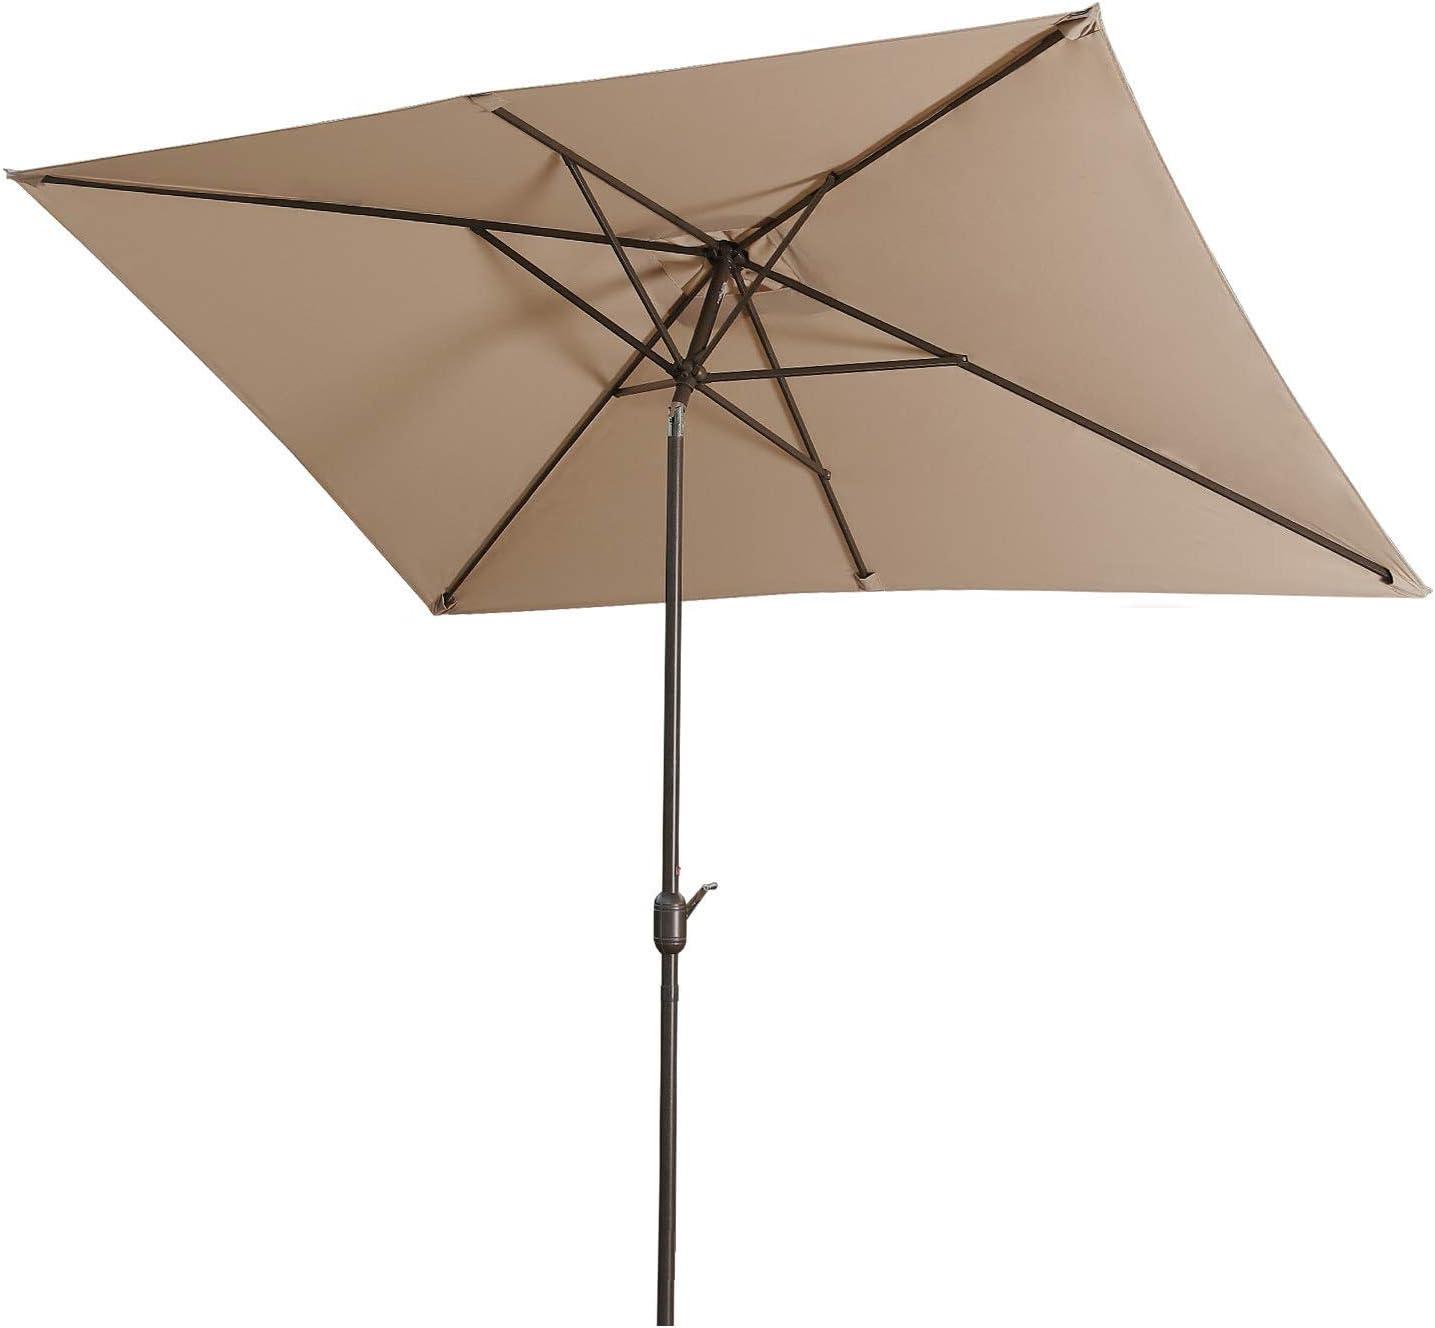 Aok Garden Outdoor Market Umbrella,10×6.5 Feet Square Patio Umbrella with Push Button Tilt and Crank Lift Ventilation,8 Sturdy Ribs Non-Fading Sunshade,Taupe Color